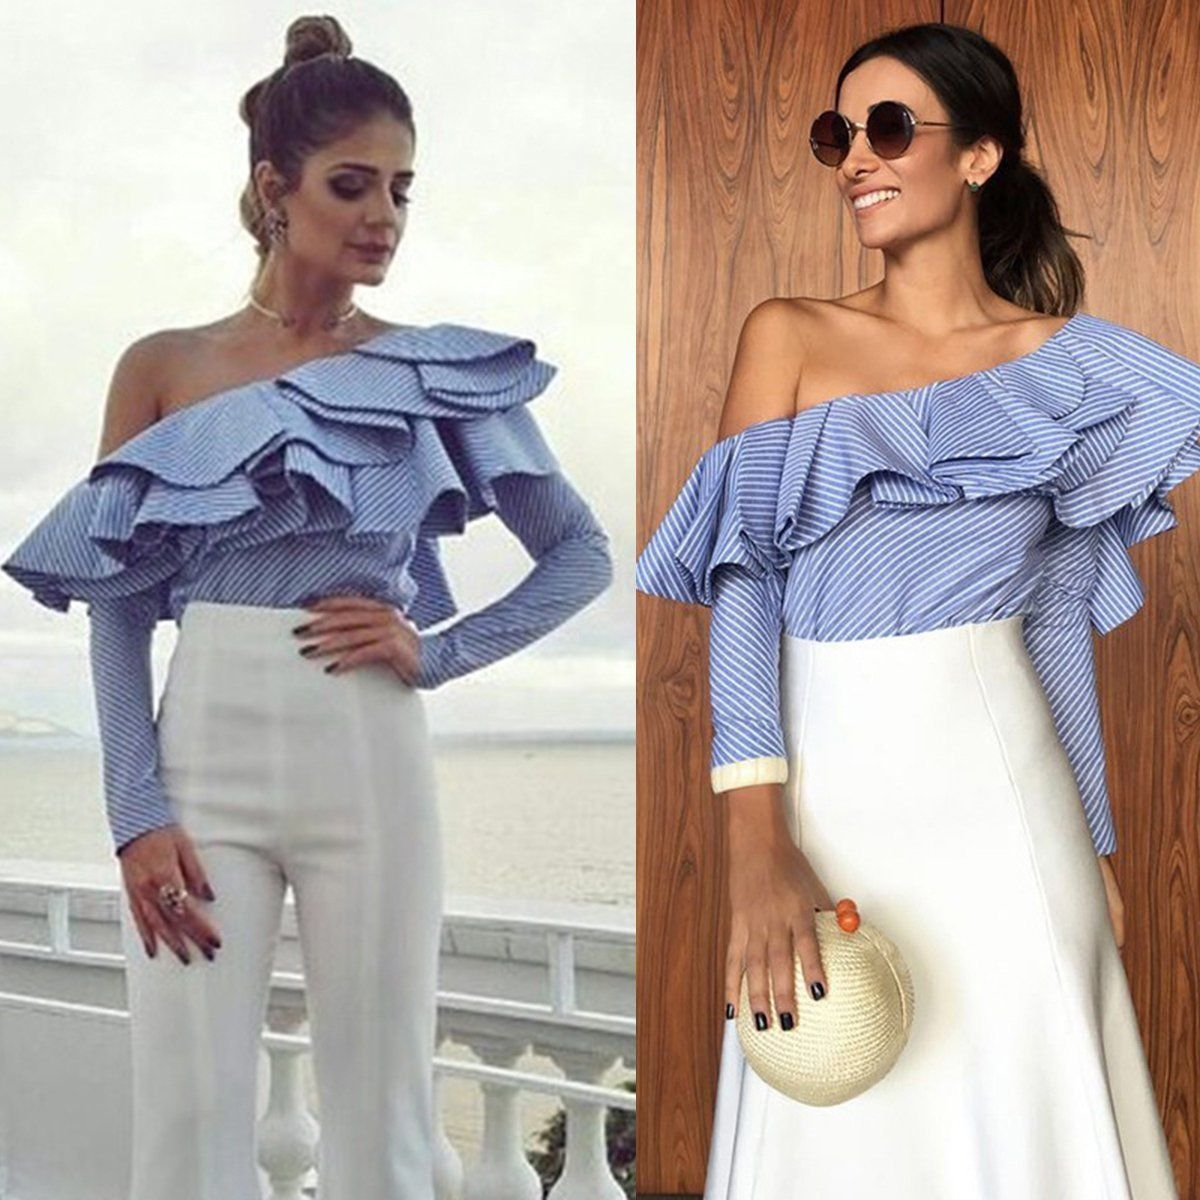 Fashion Womens Blue White Striped One Shoulder Blouse Ruffles Long Sleeve Casual Women's Shirt Blouses Top Plus Size S To 2XL